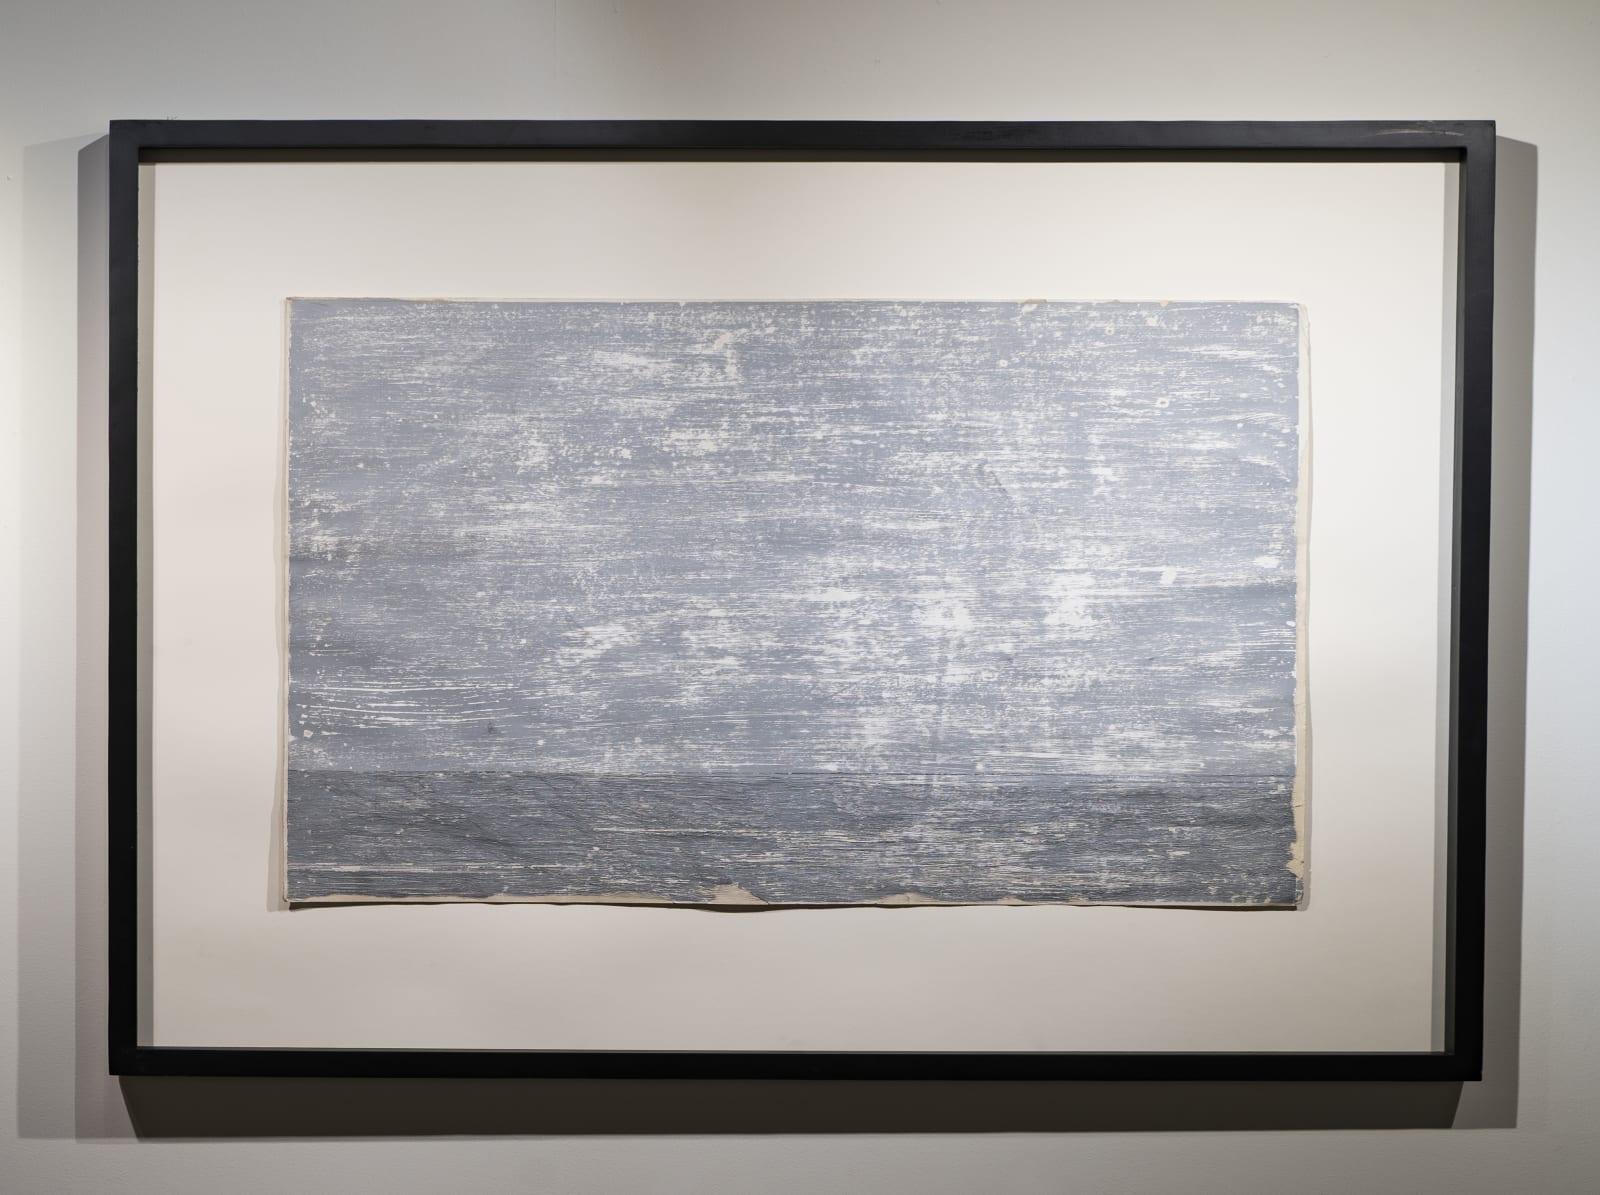 DEEPAK AGASTHYA Number 17, 2020 | Glass marker on paper | 8.3 x 11.5 in.